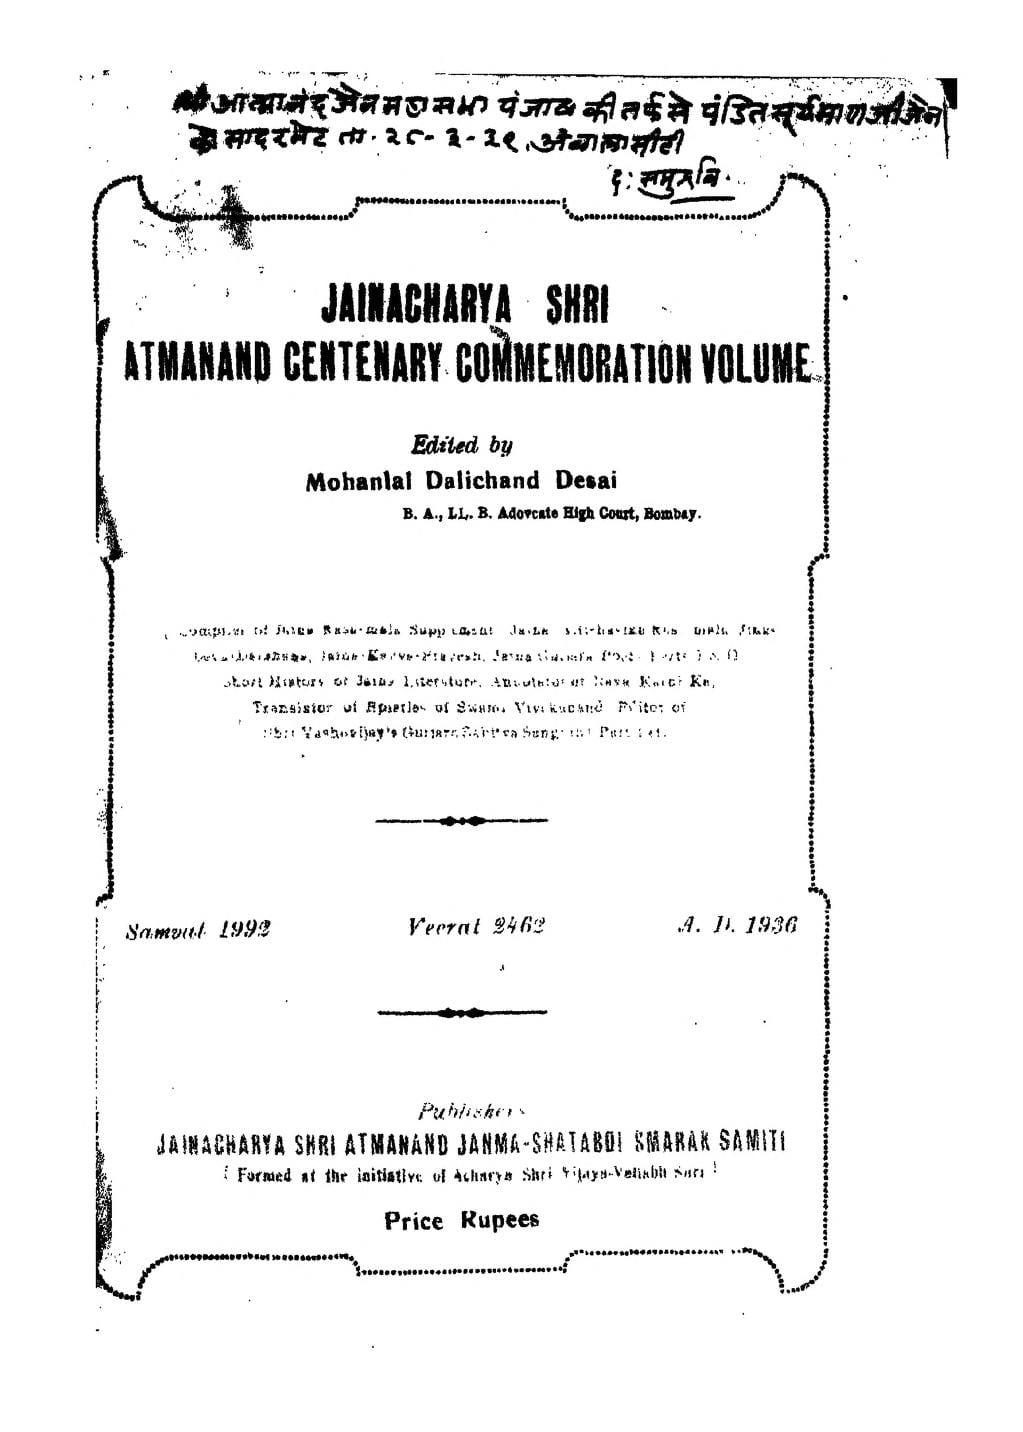 Book Image : जैनाचार्य श्री आत्मानंद सेंटेनरी कोम्मेमोरातिओं वोलुम - Jaincharya Shri atmanand centenary commemoration volume